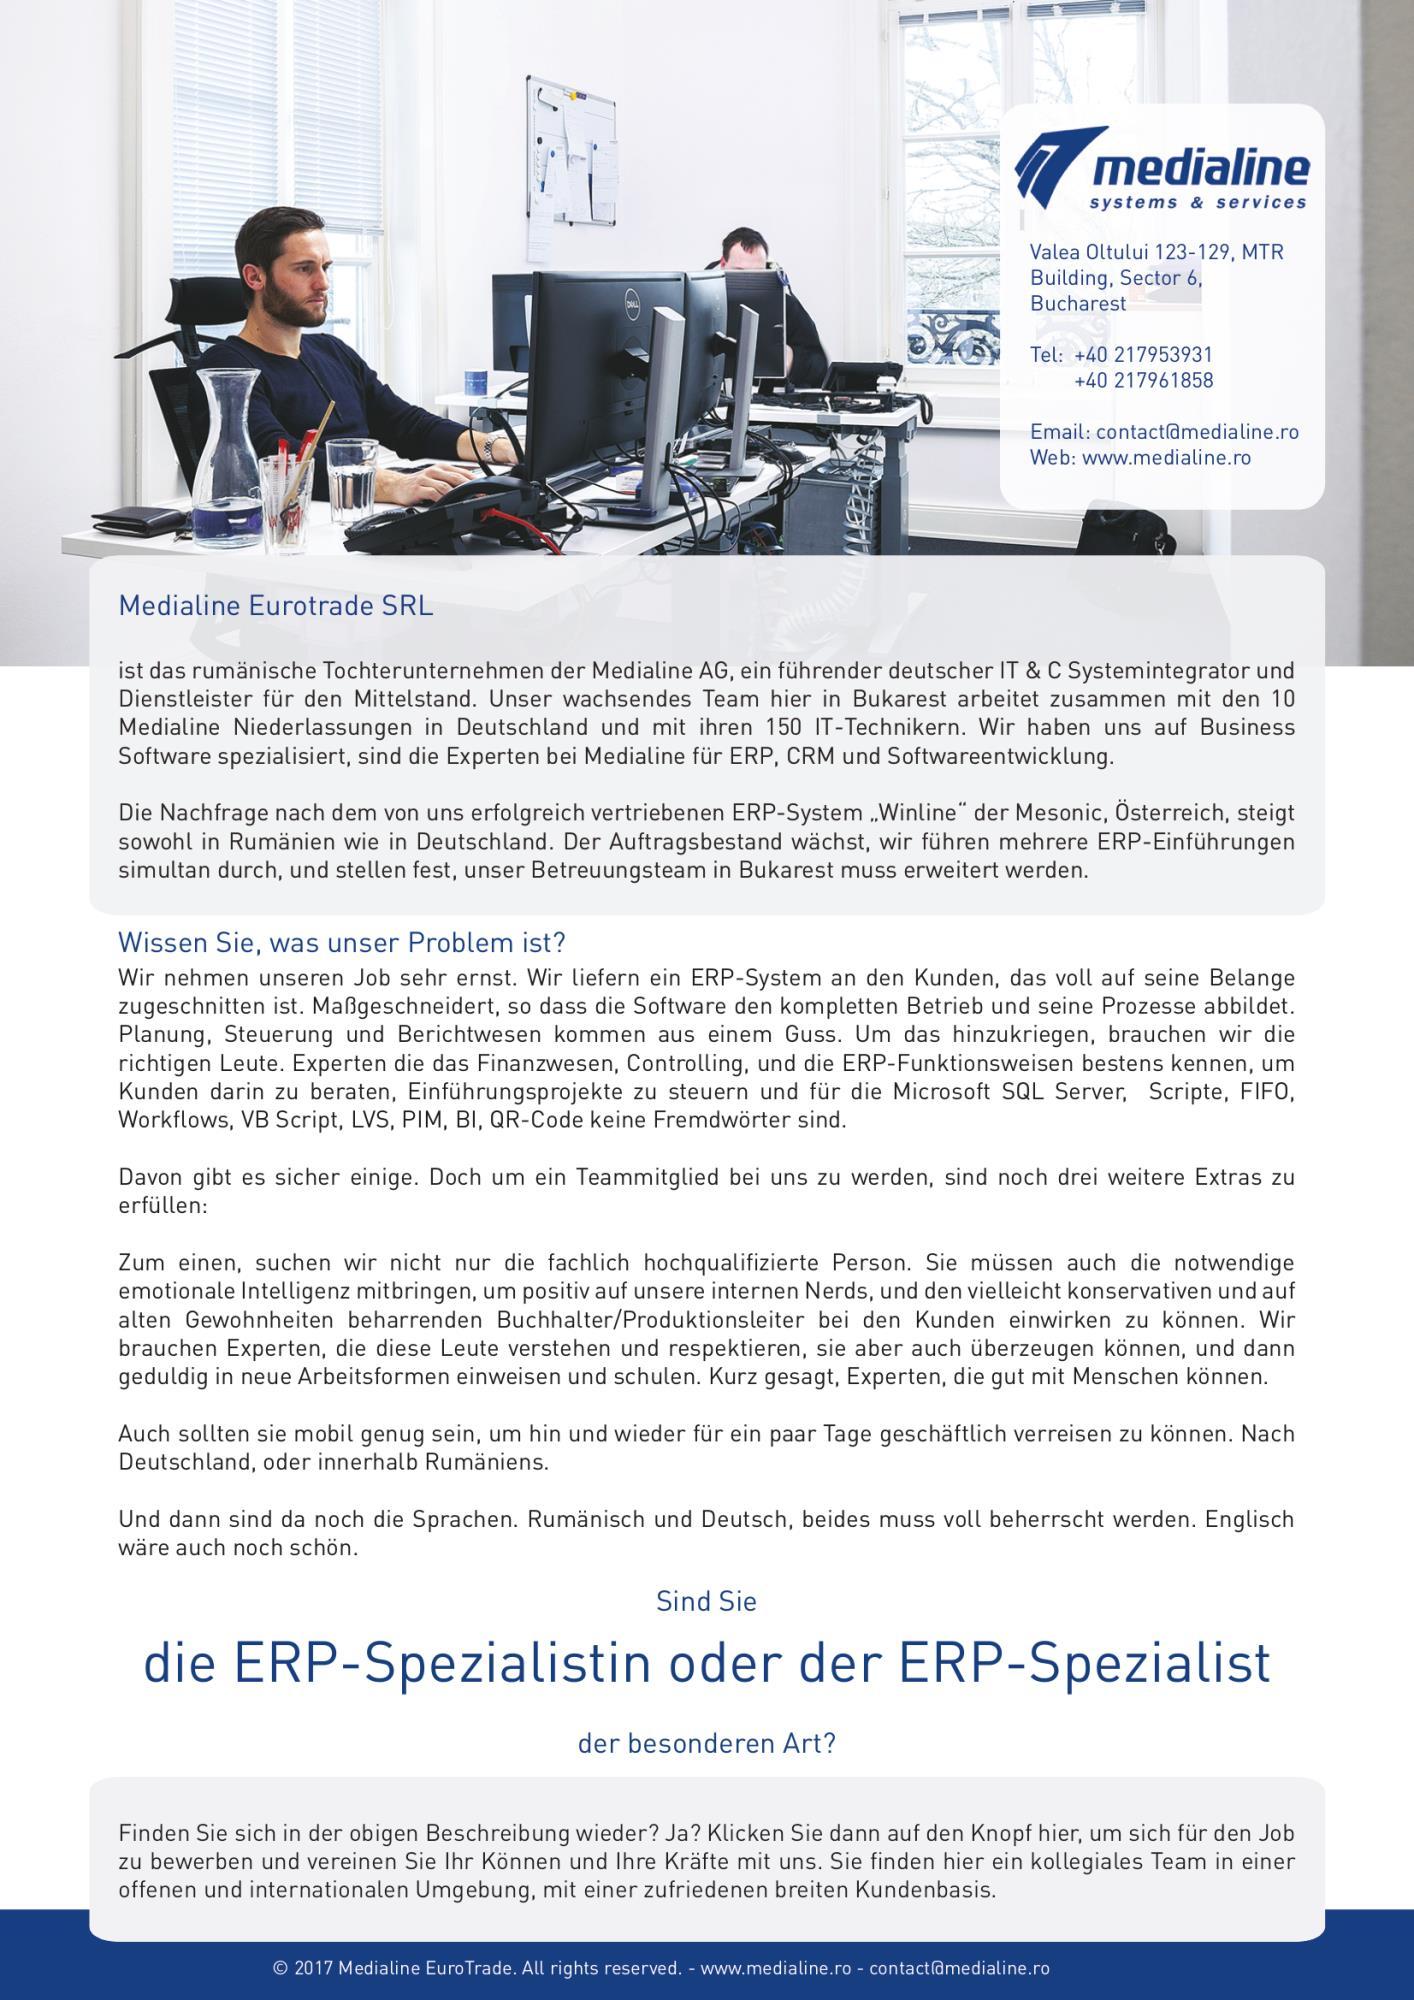 ERP Spezialist